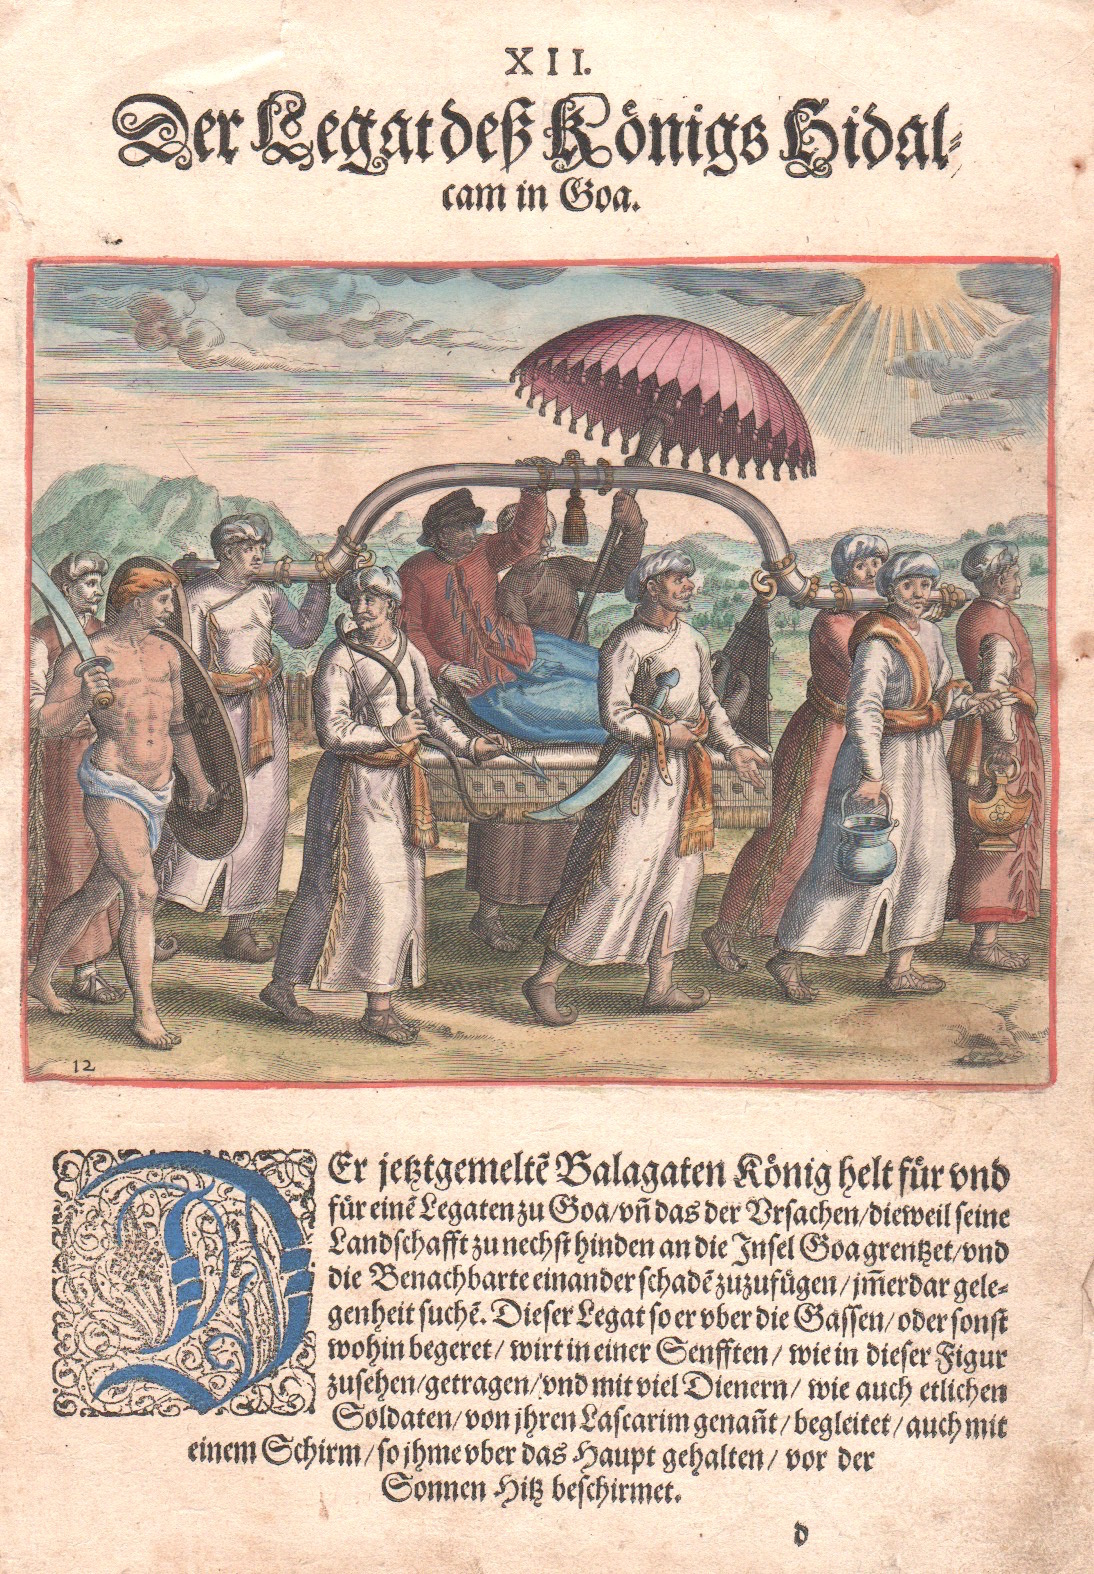 Bry, de Theodor, Dietrich XII. Der Legat deß Königs Hidalcam in Goa.